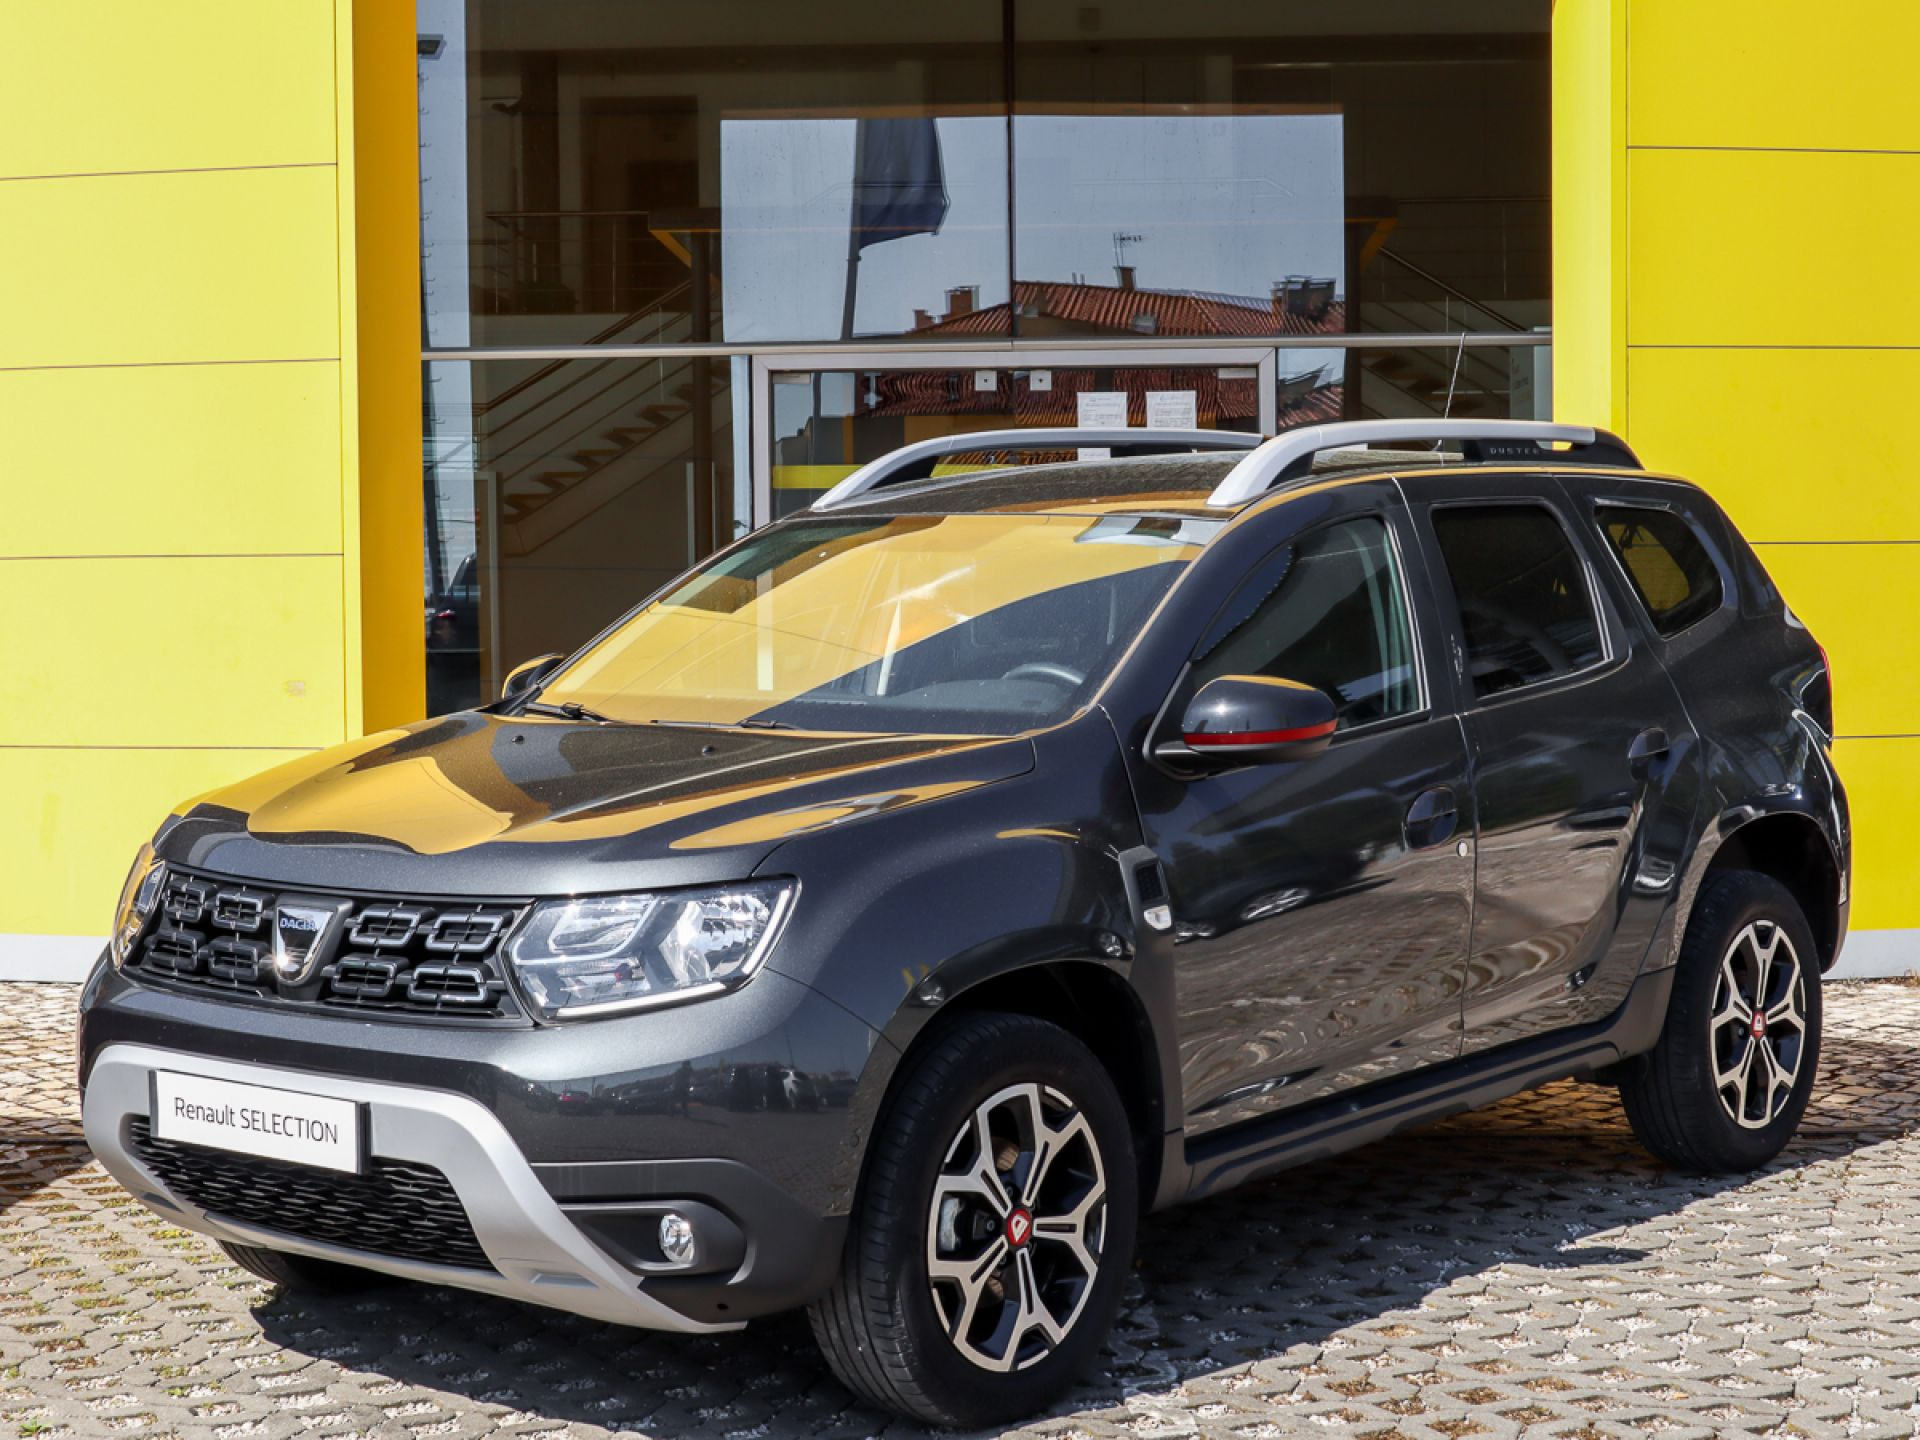 Dacia Duster 1.3 TCE 130cv SL Adventure usada Setúbal